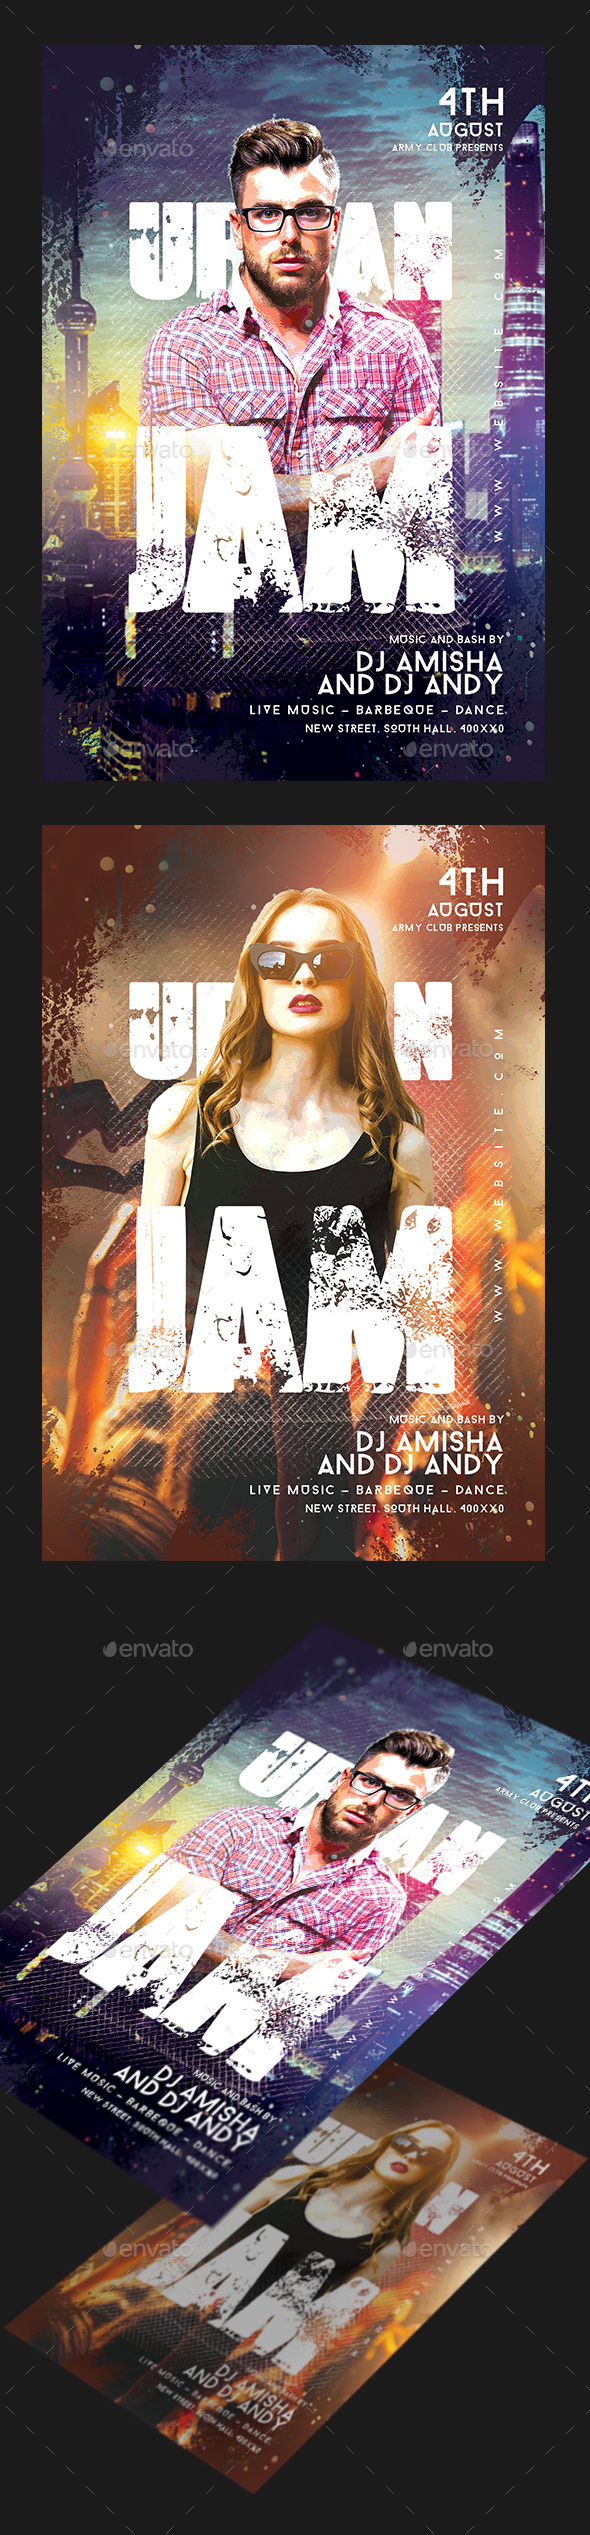 Urban Jam Party Flyer